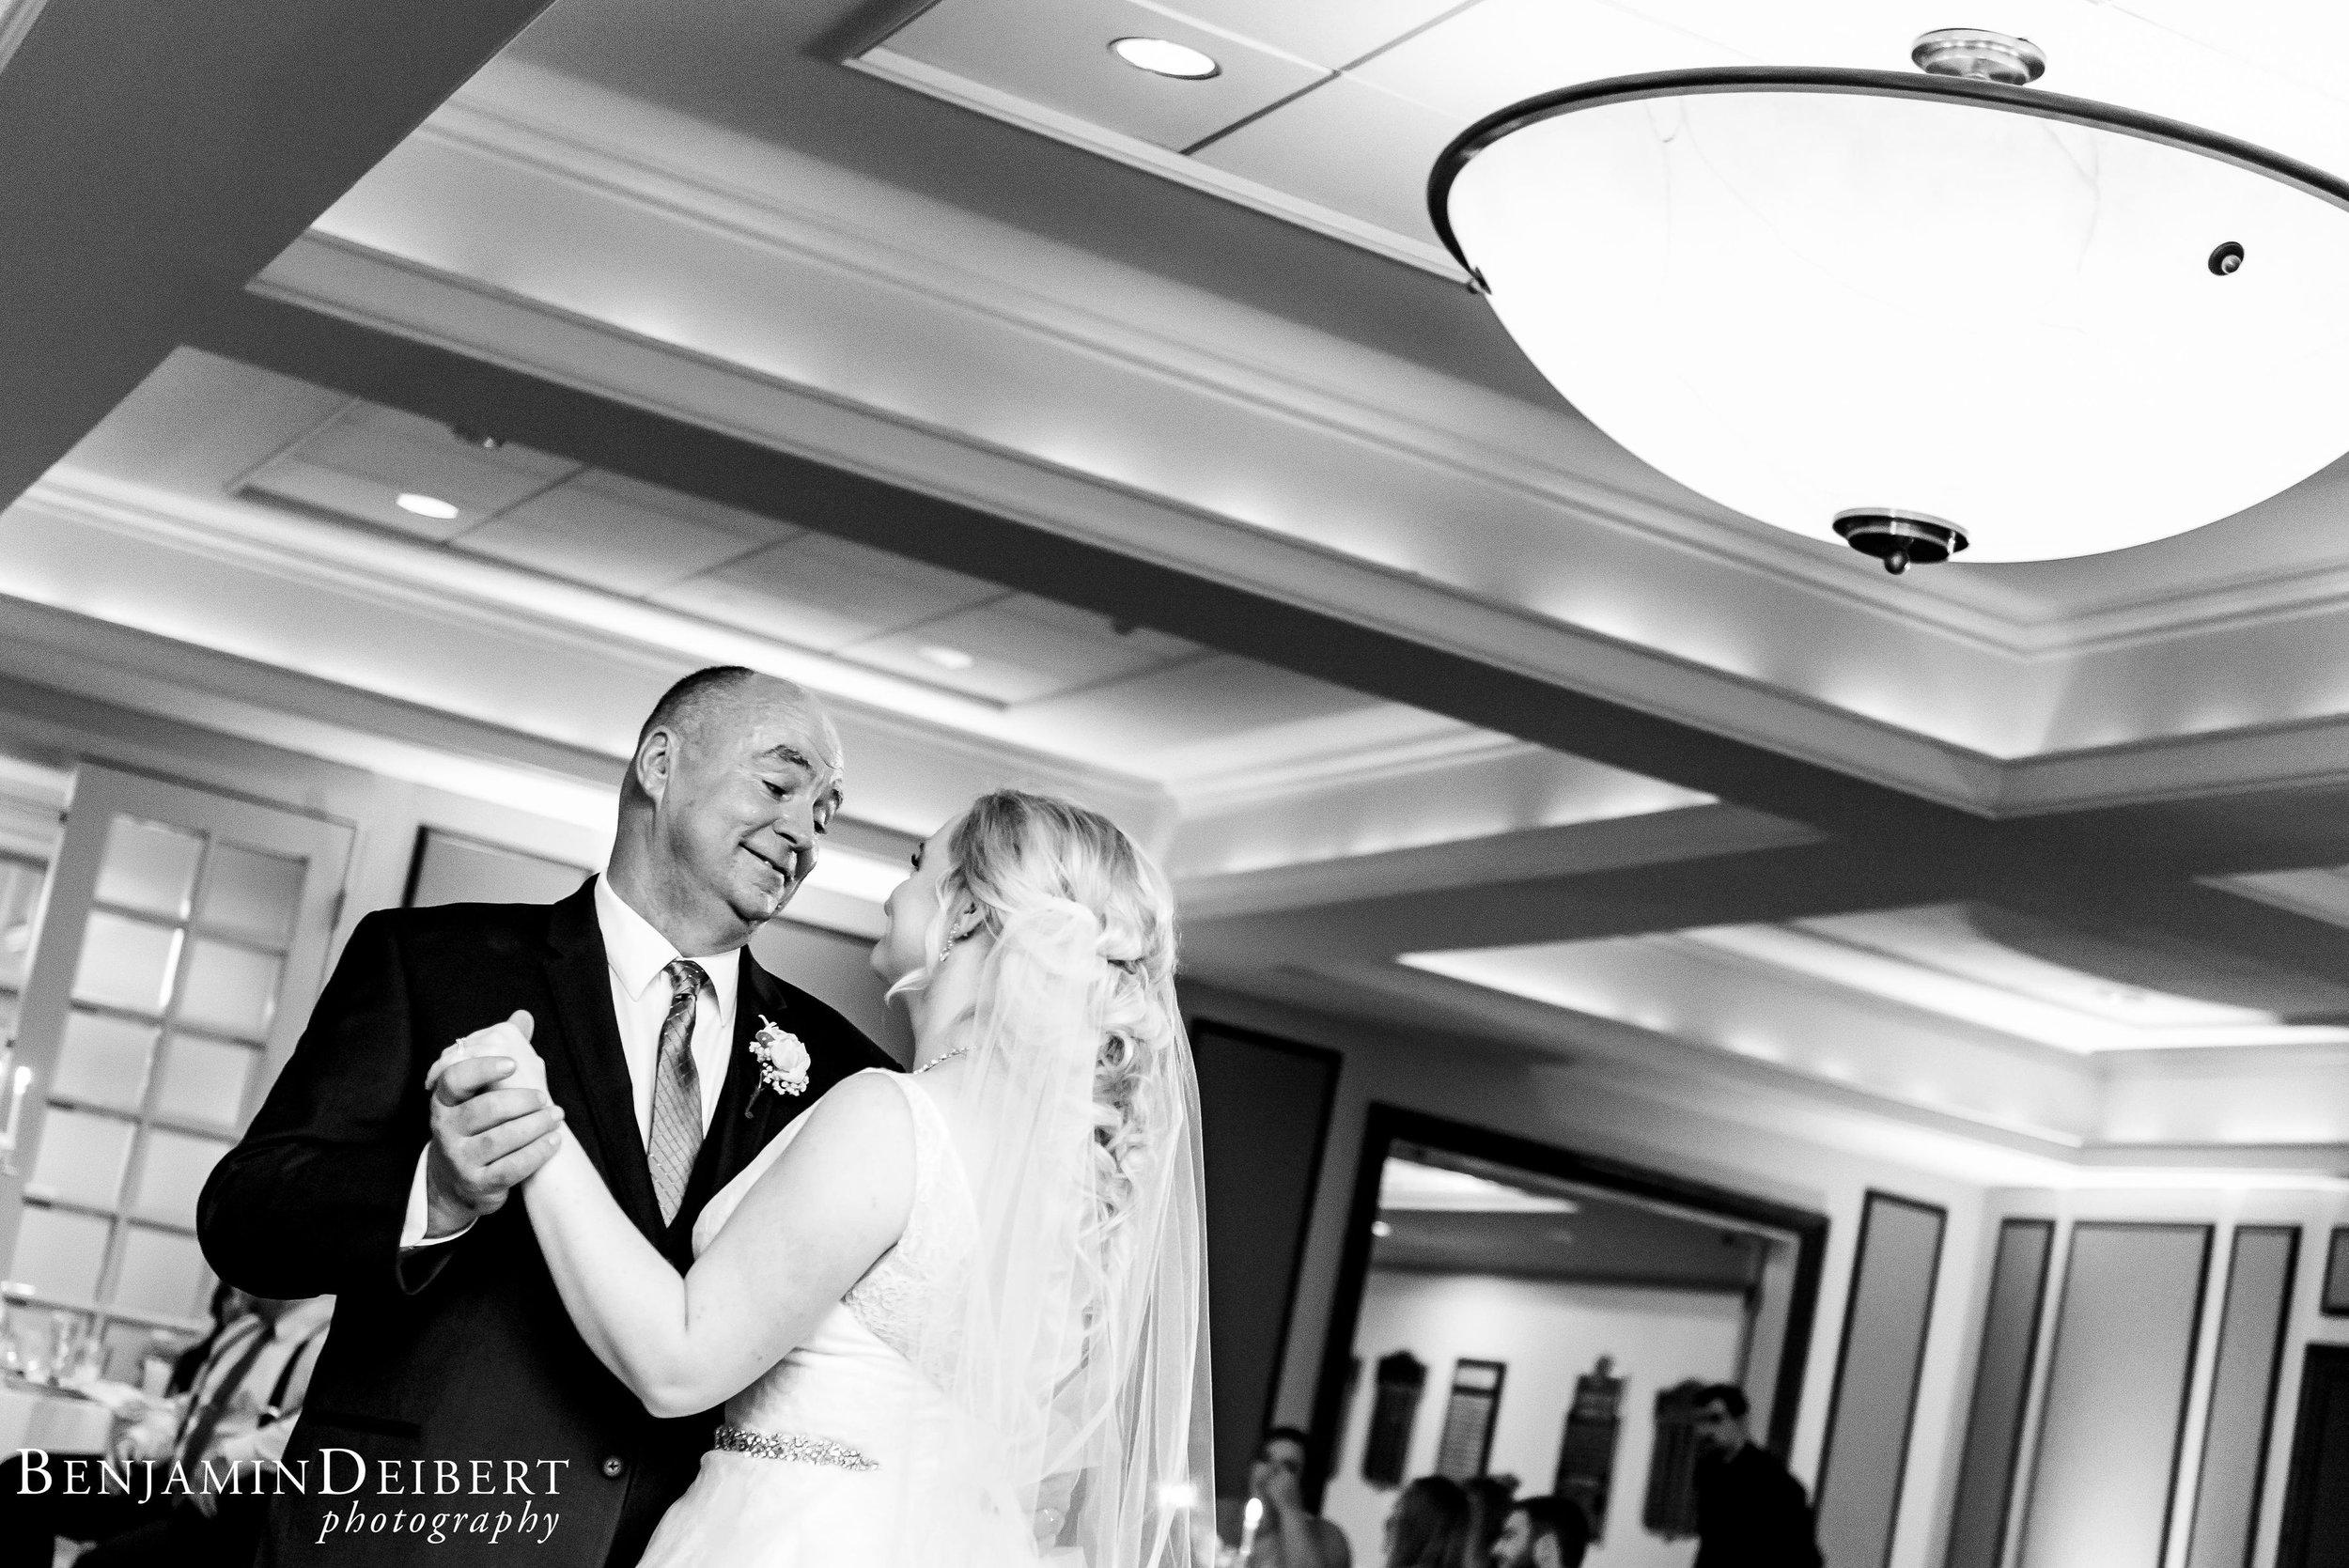 AshleyandDerrick_RadnorValleyCountryClub_Wedding-69.jpg